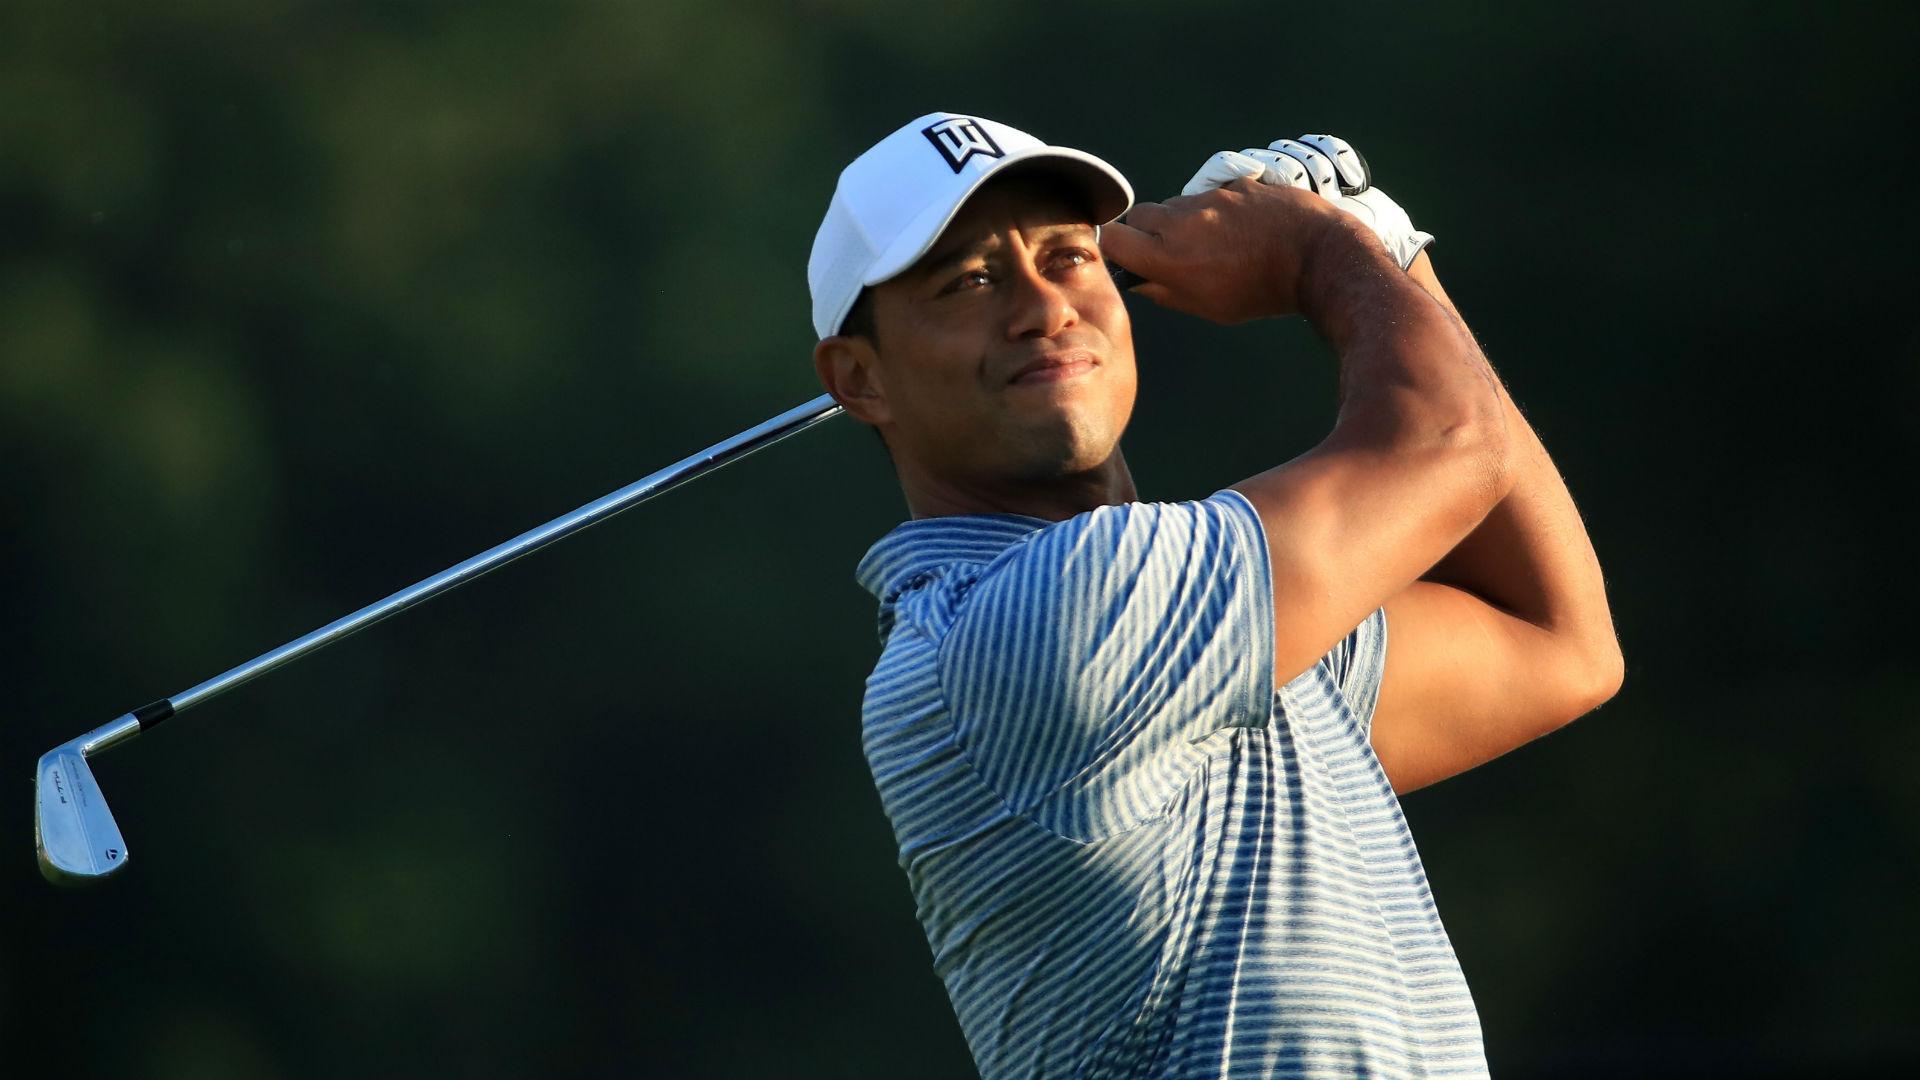 Fit-again Tiger Woods optimistic over East Lake return